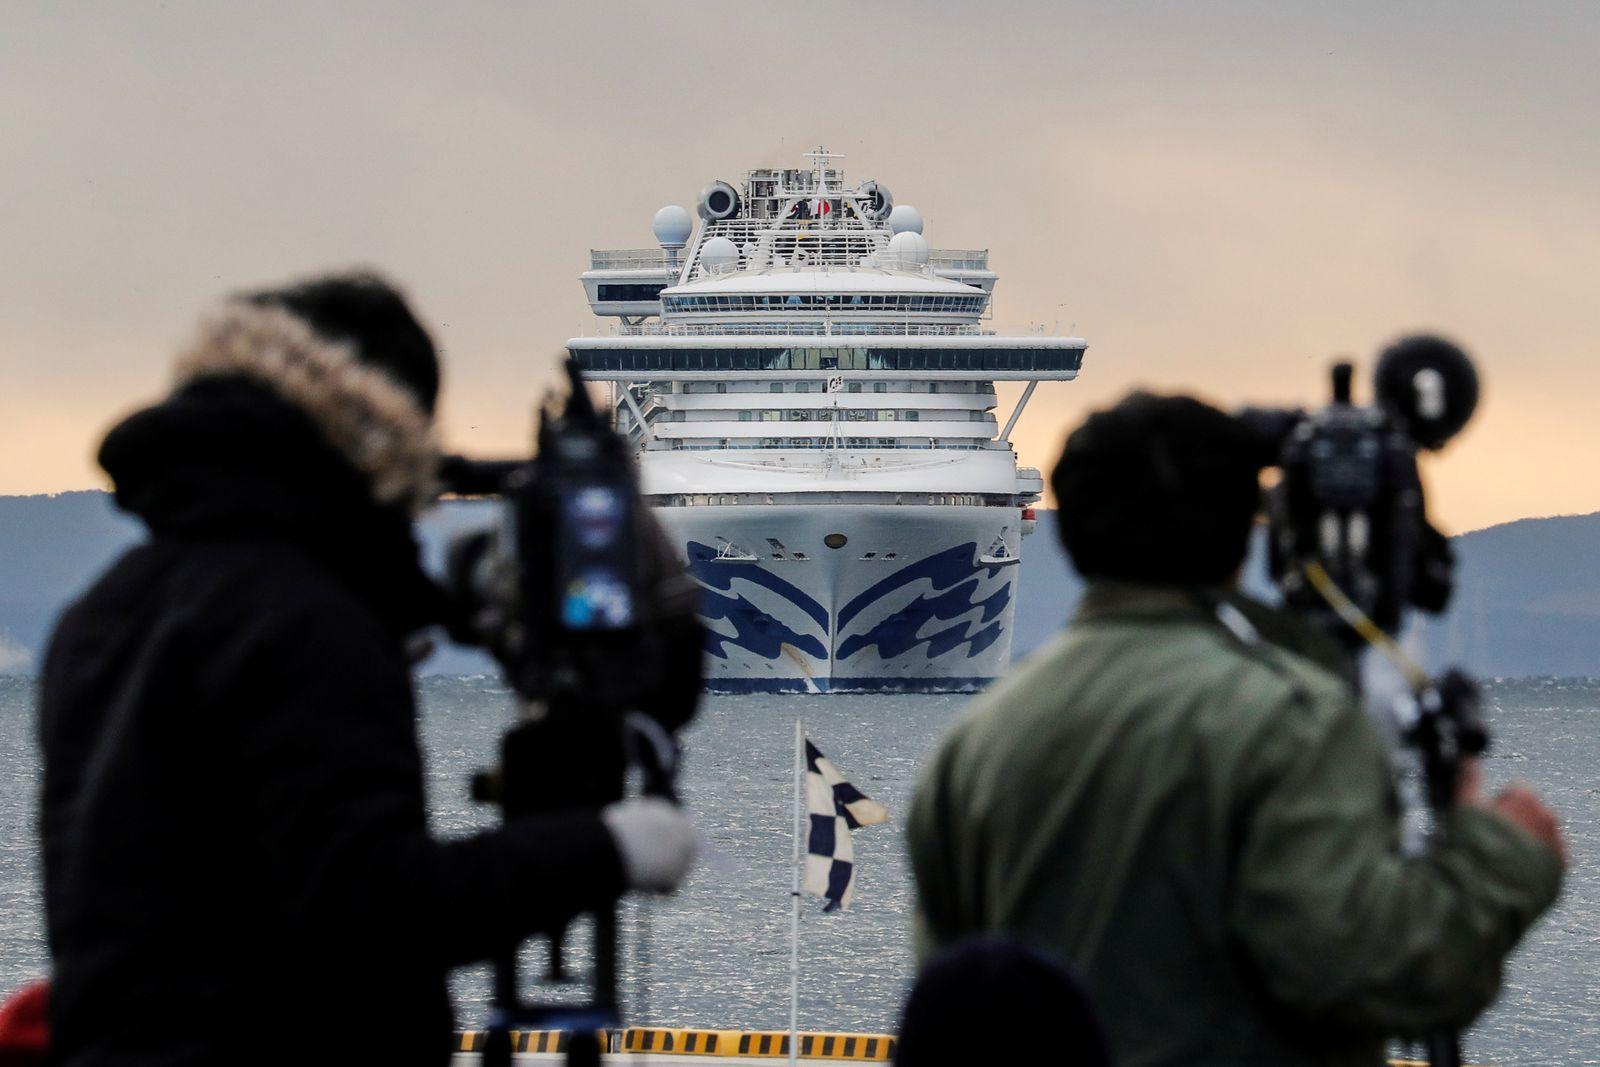 Cruise ship Diamond Princess arrives at Daikoku Pier Cruise Terminal in Yokohama